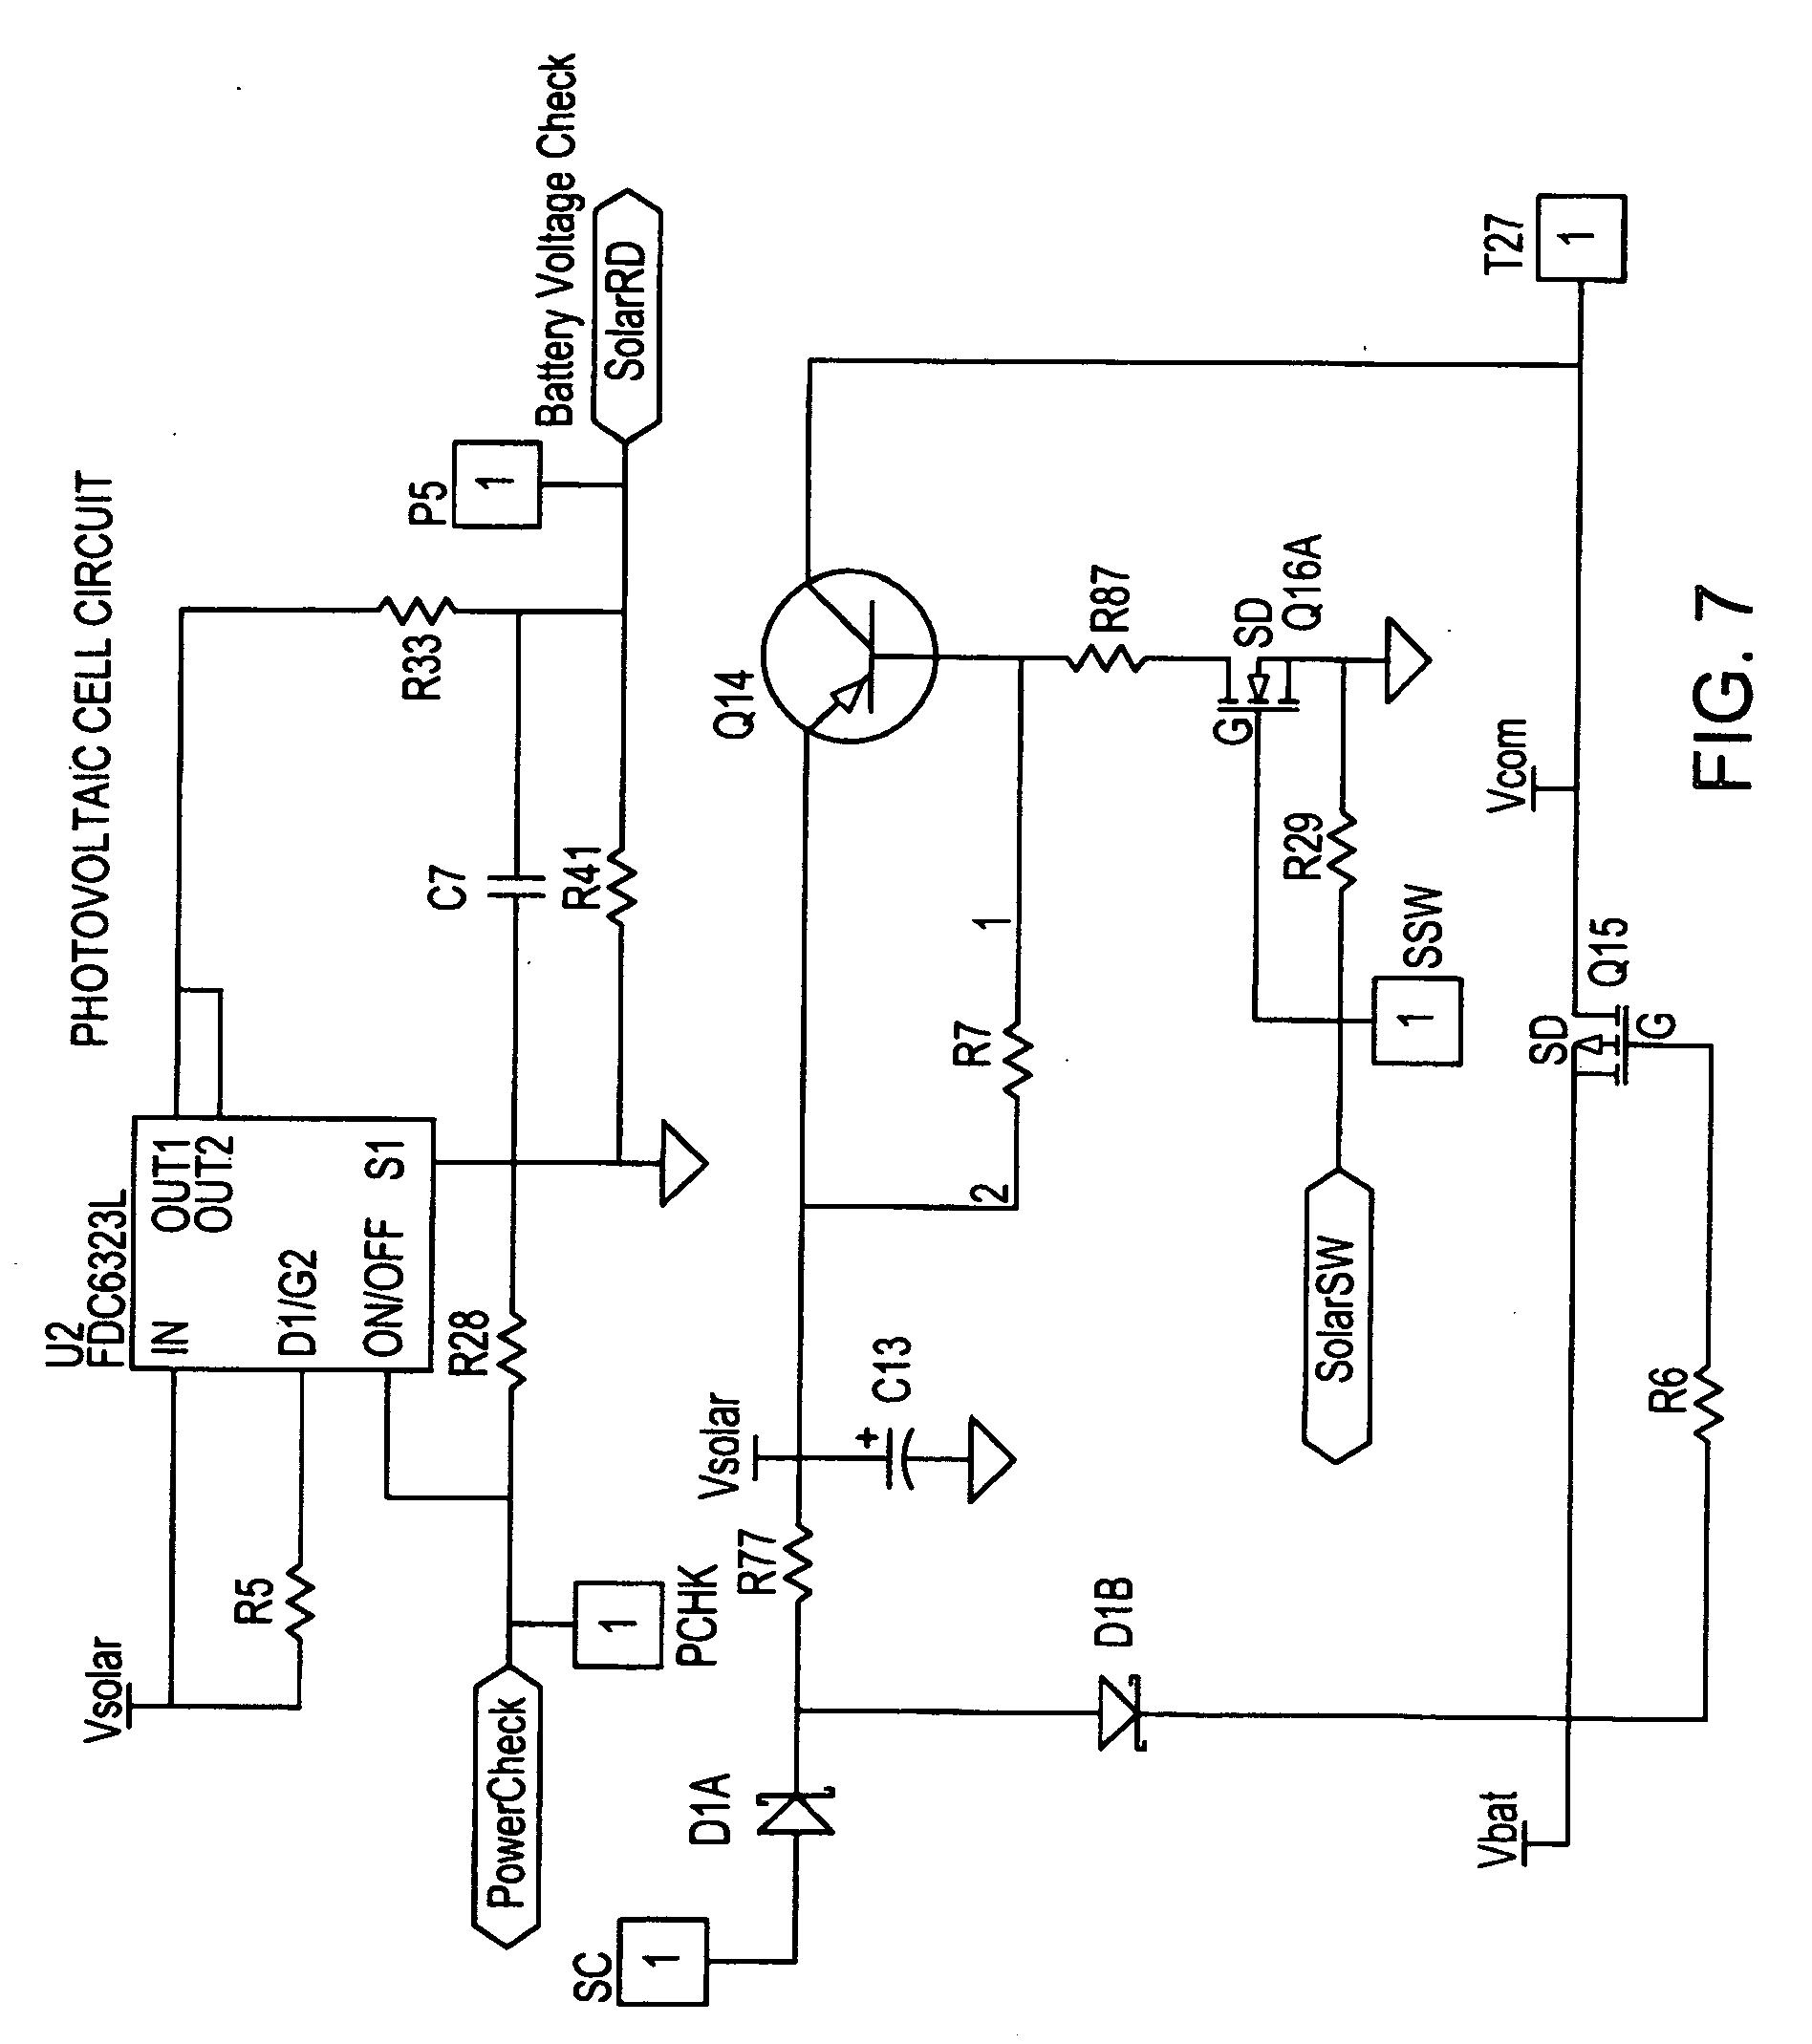 For Sloan Sensor Wiring Diagrams Garage Door Safety Sensor